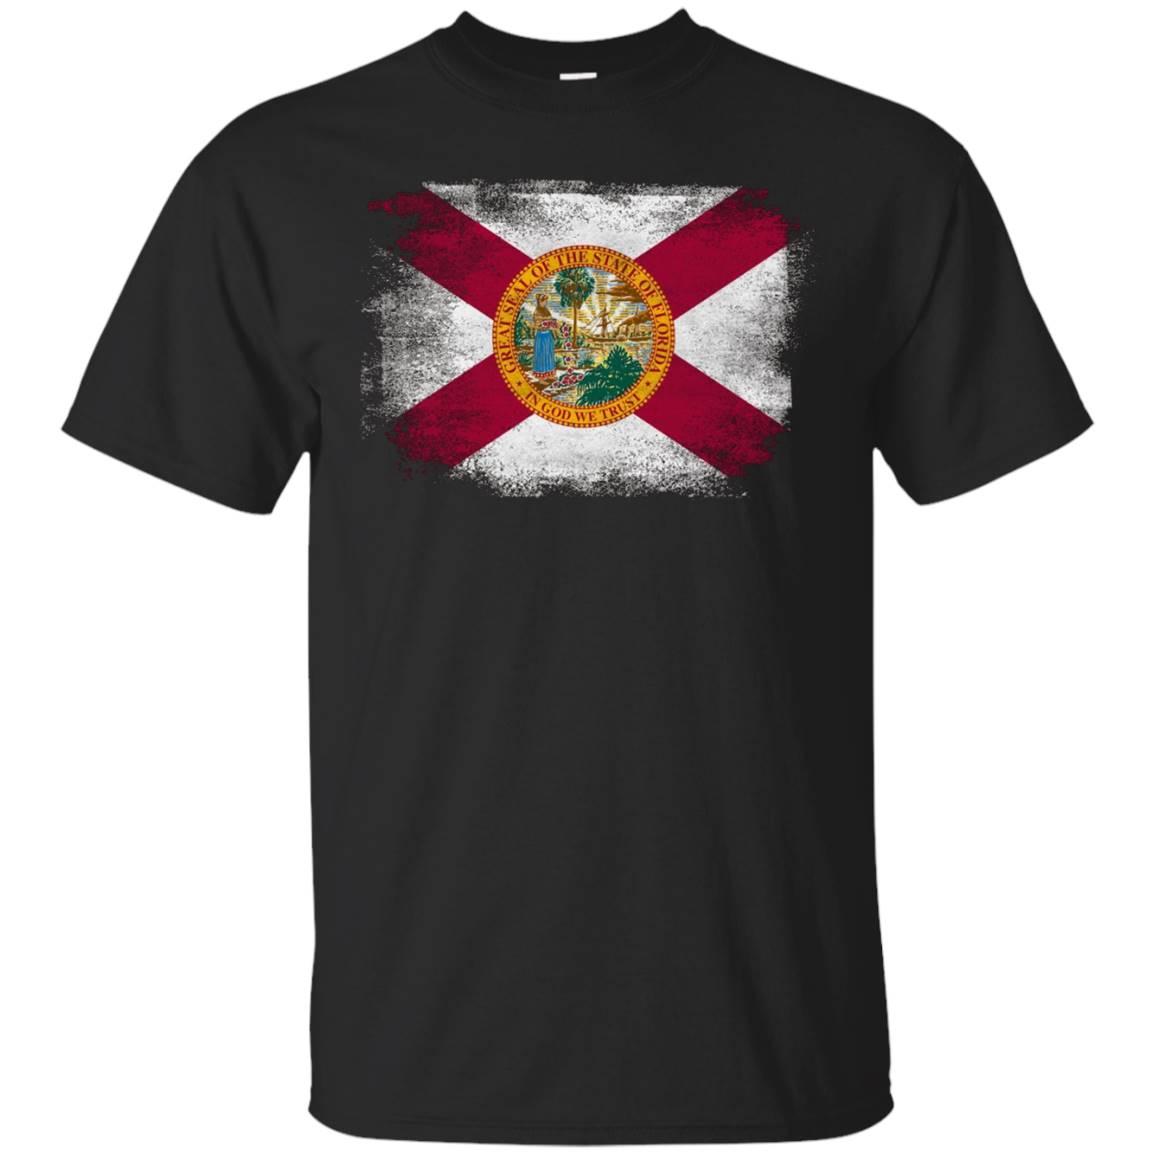 Florida State Flag Distressed Vintage Shirt